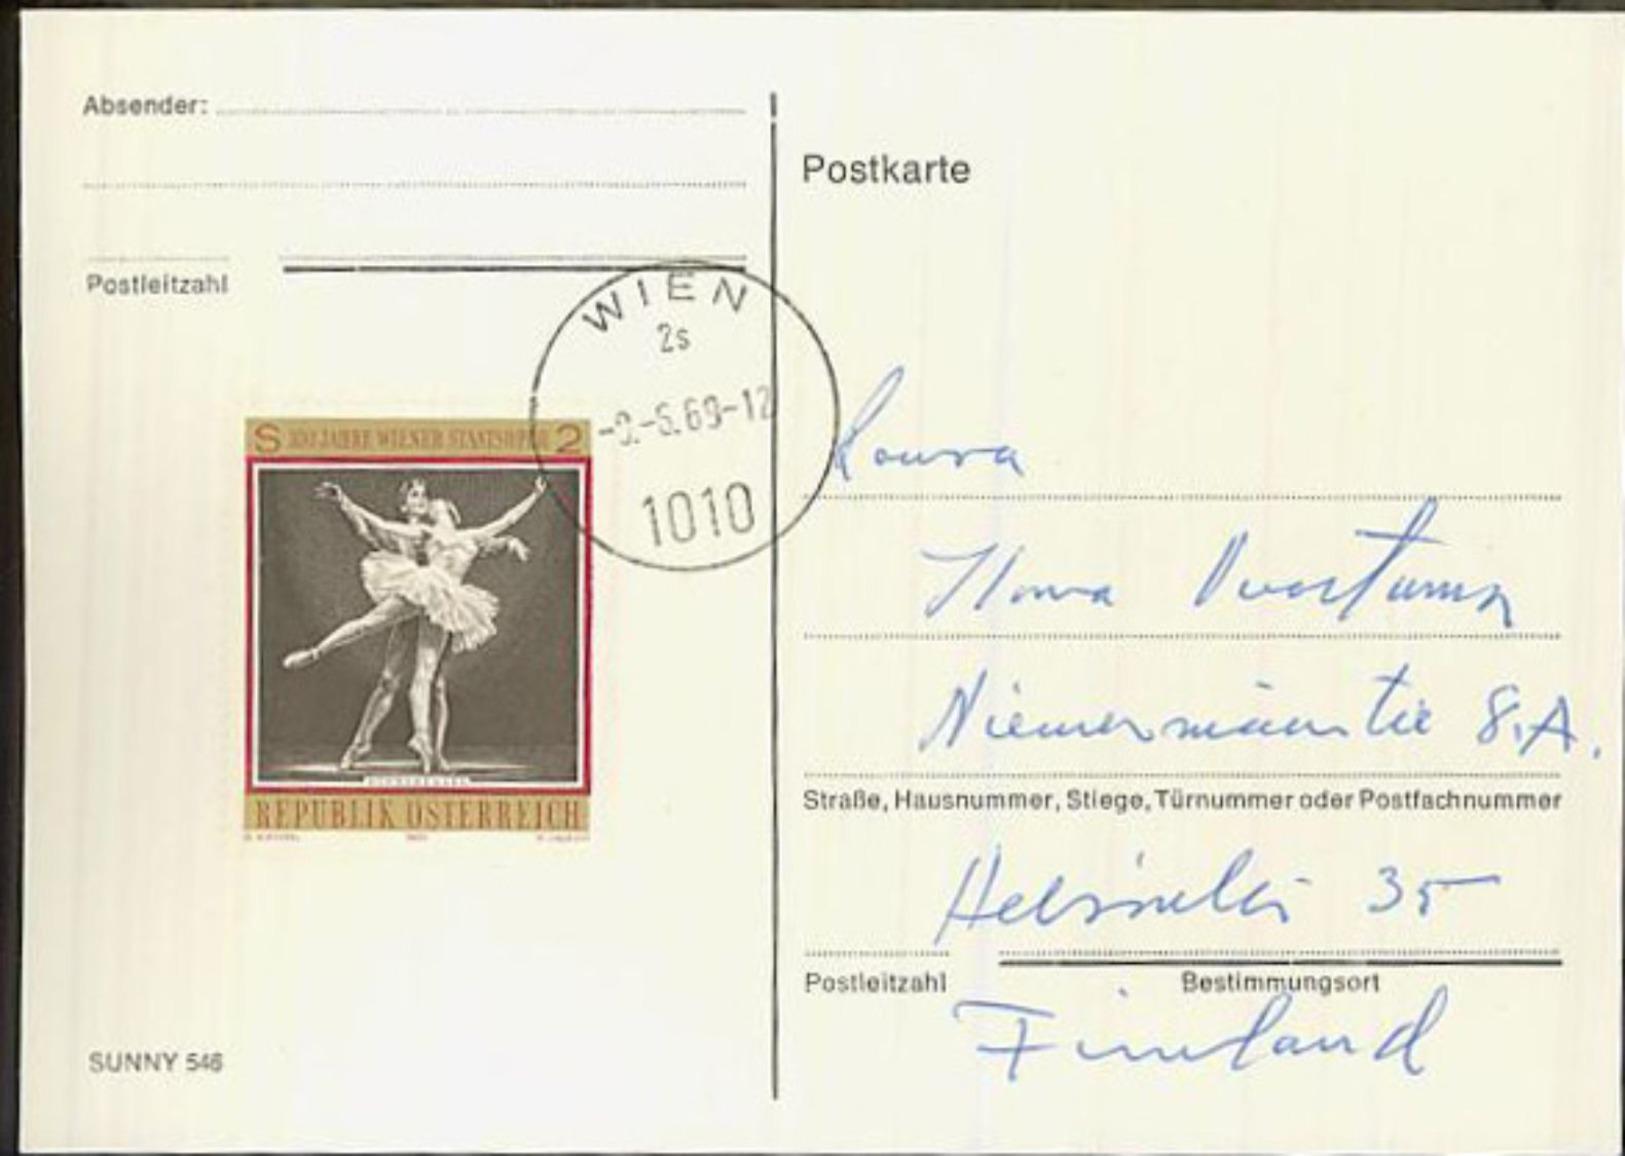 Austria/Österreich 1969 Pc To Finland - 1961-70 Covers